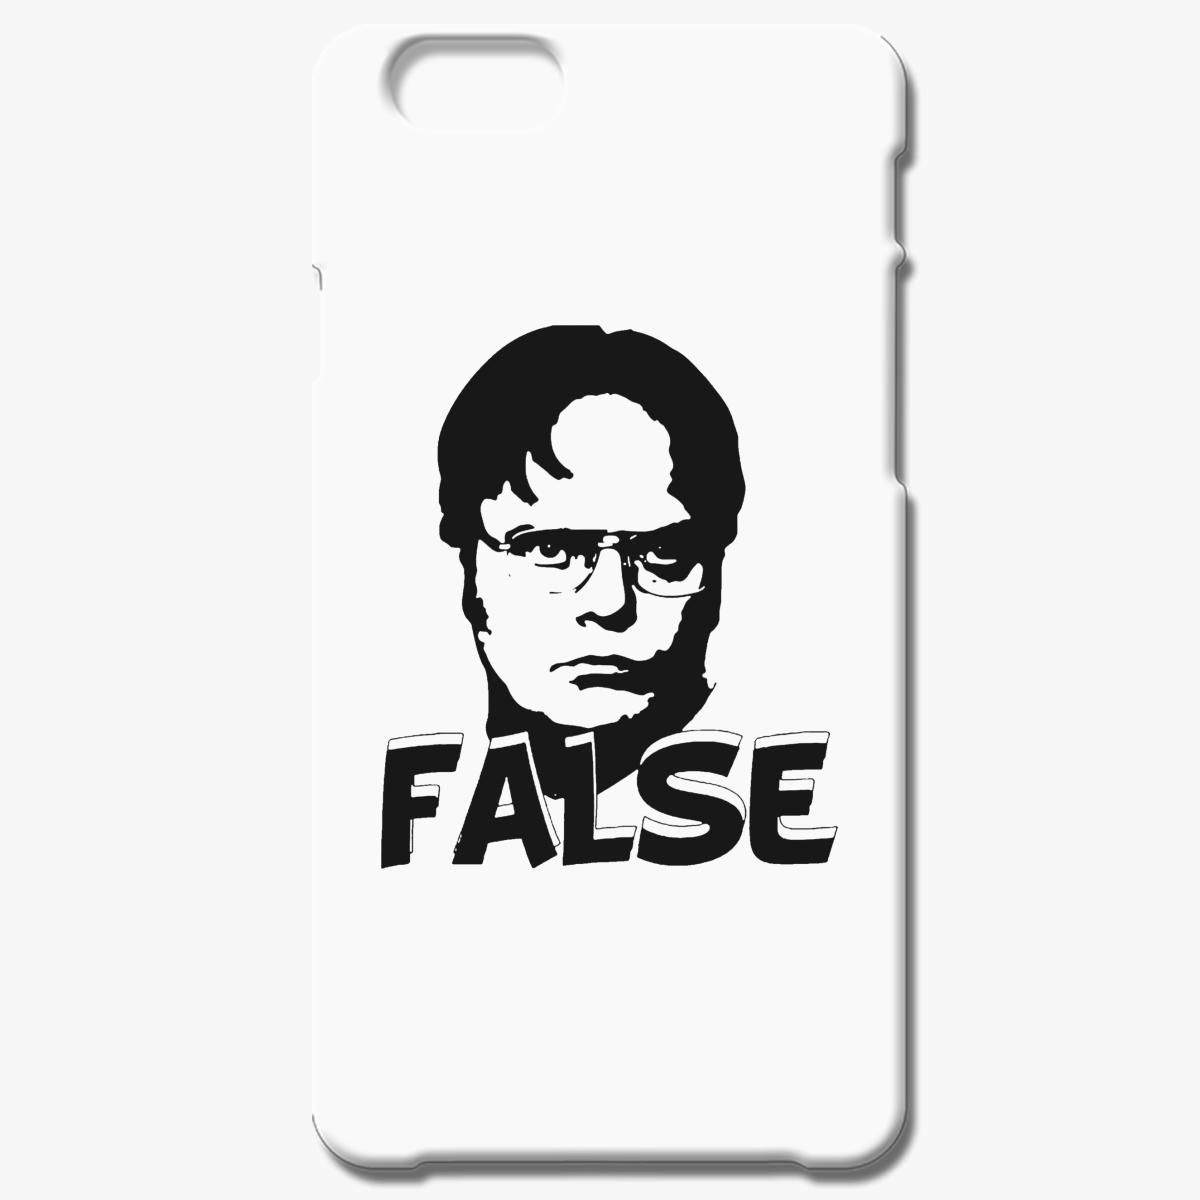 Dwight Schrute False Iphone 6 6s Plus Case